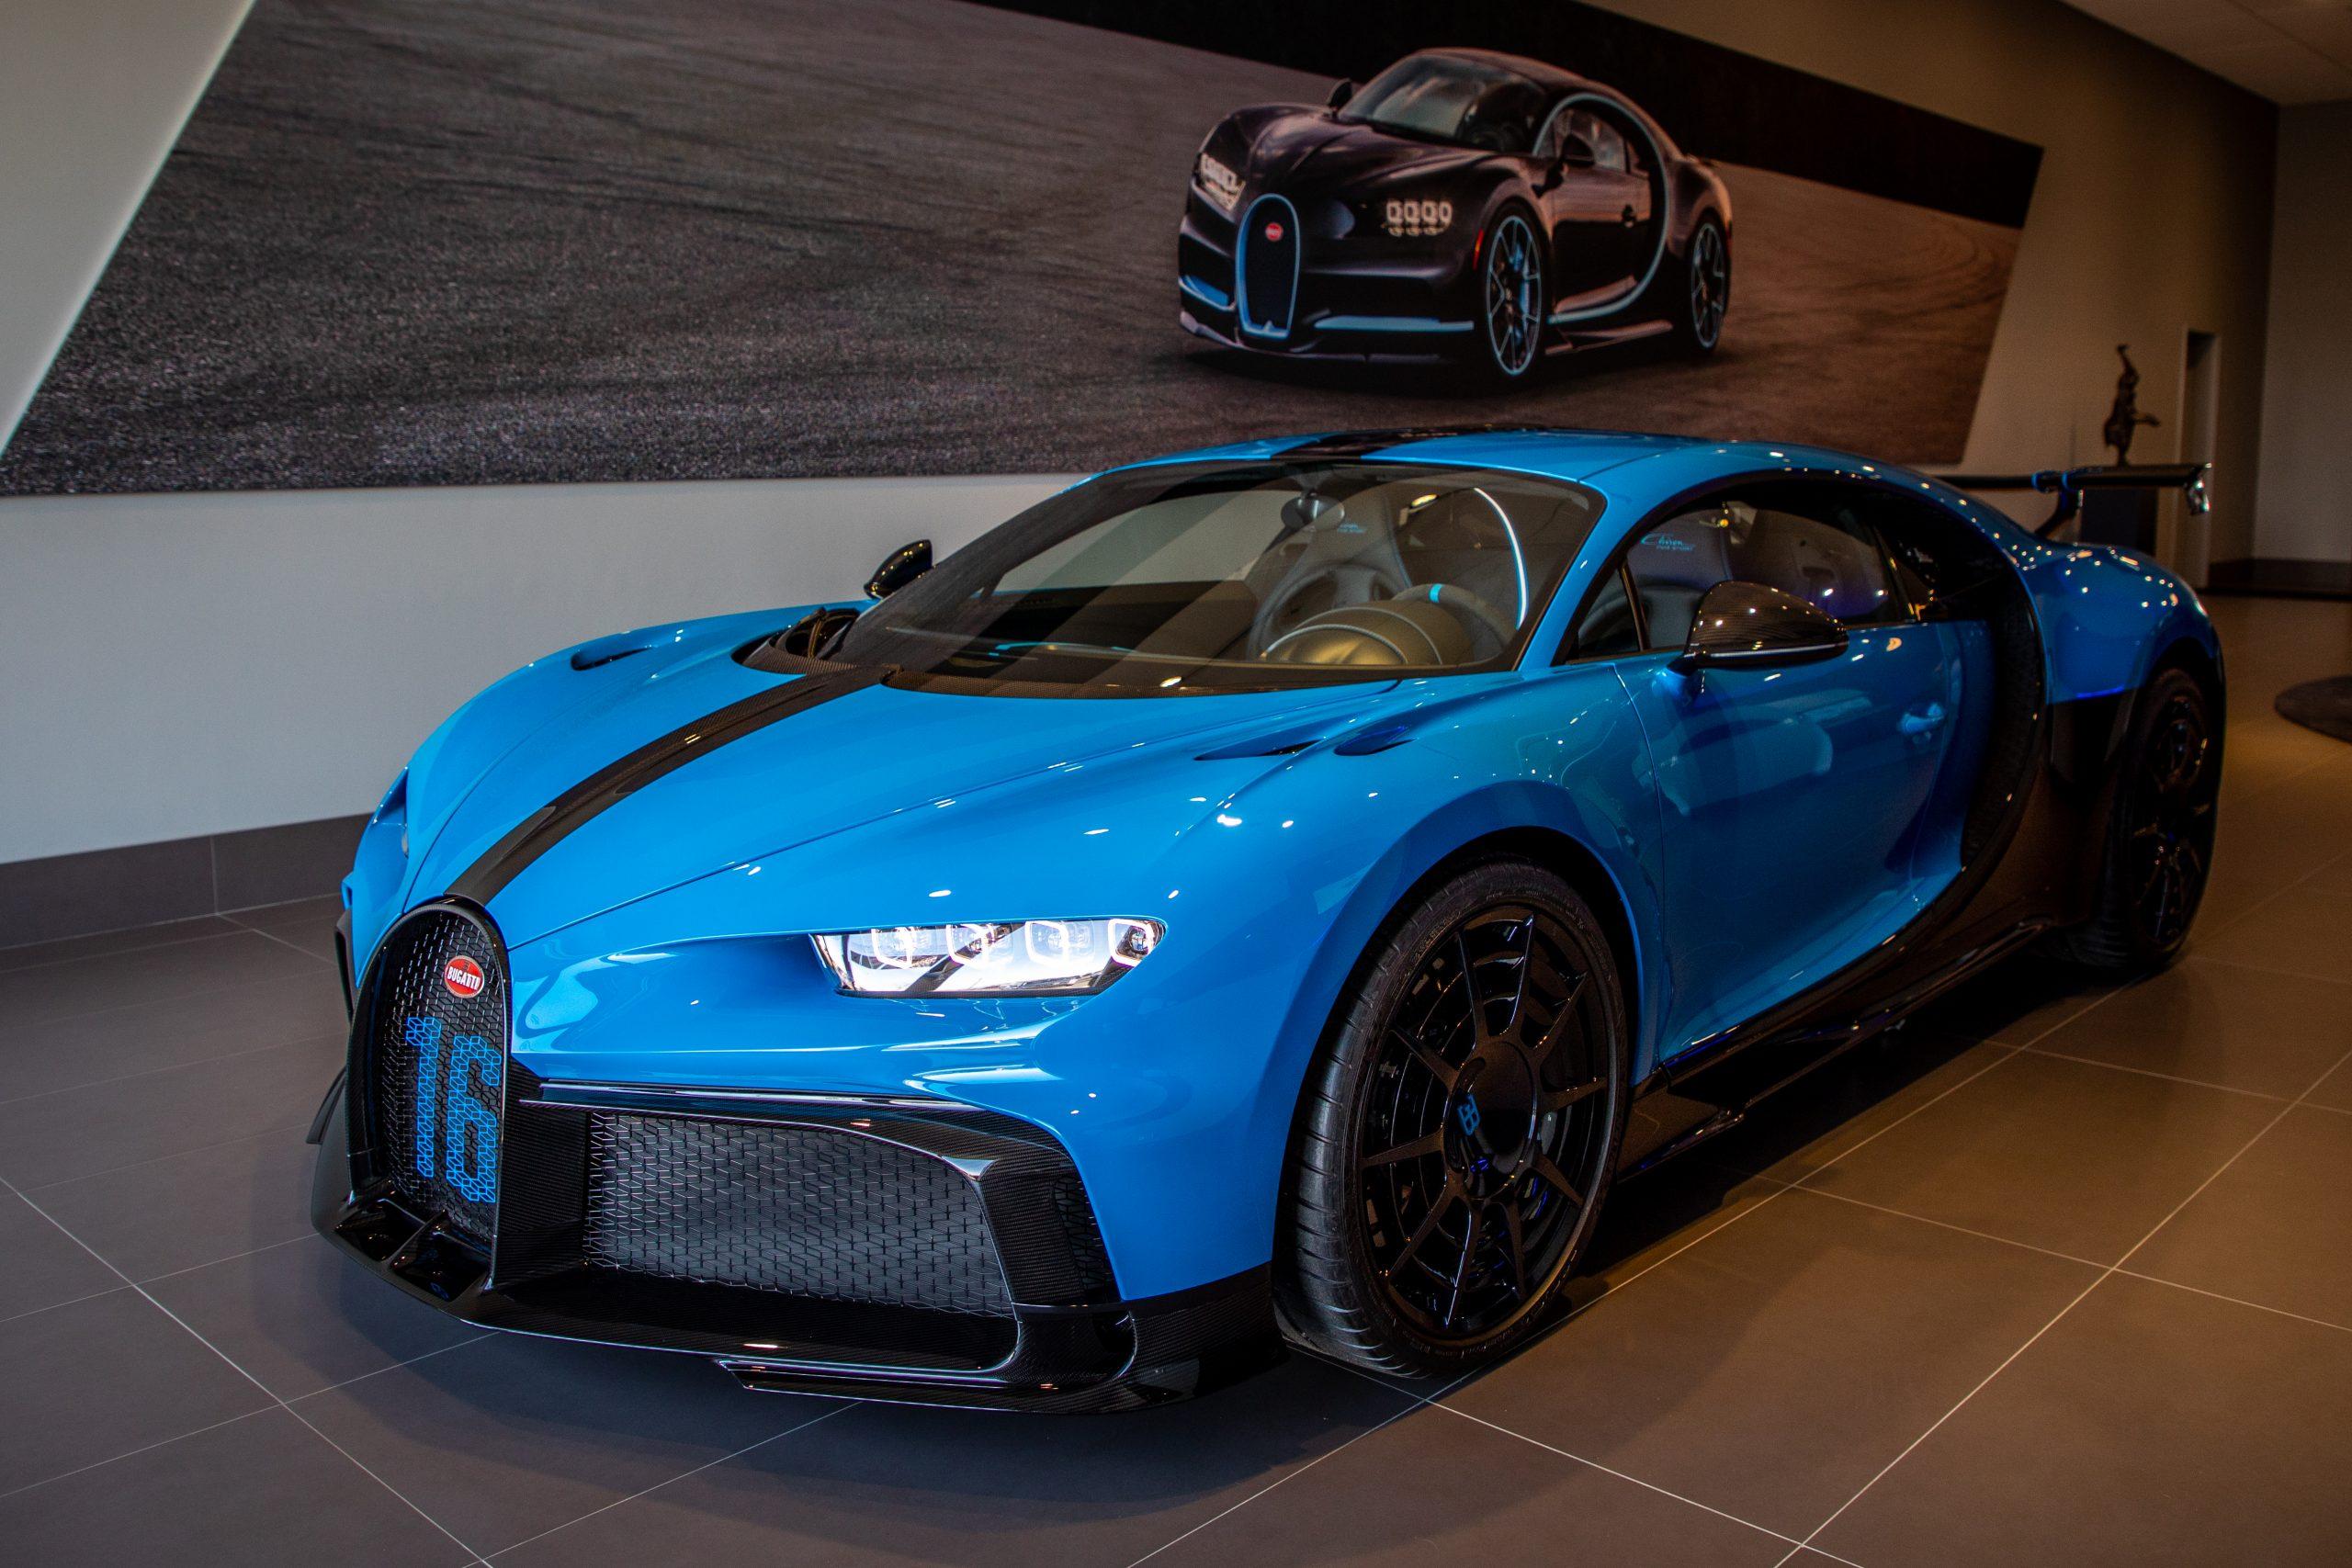 Bugatti-Chiron-Pur-Sport-show-car-13